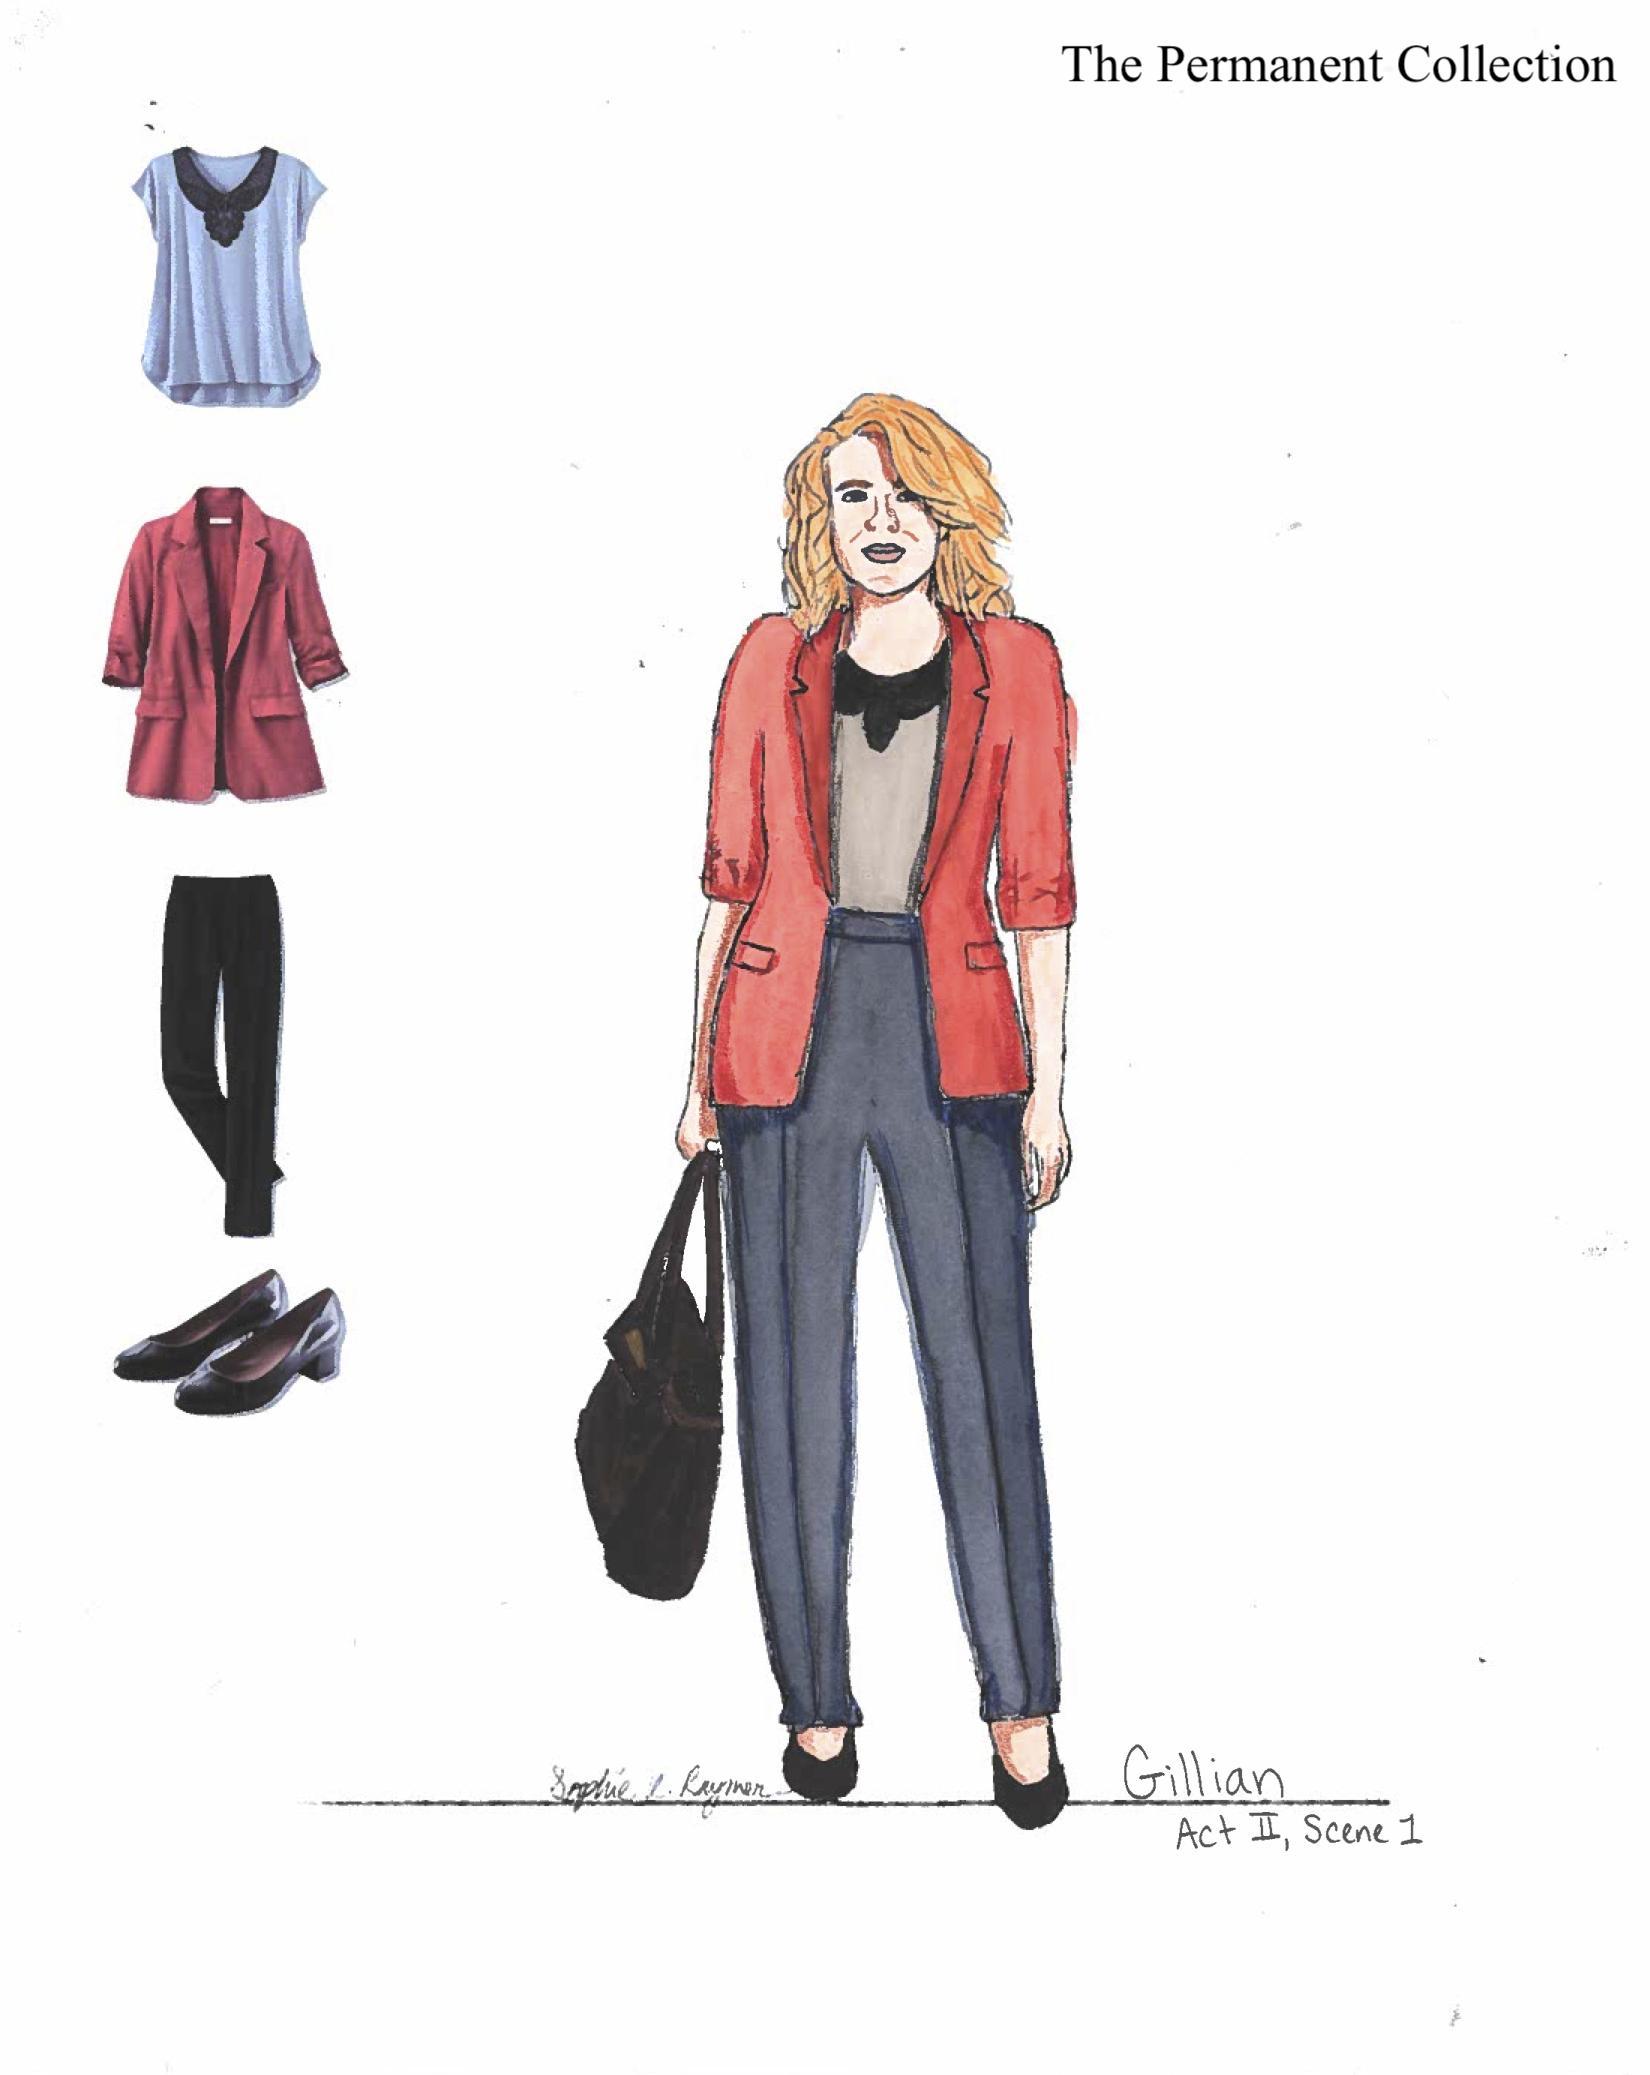 Gillian Act 2, Scene 1.jpg